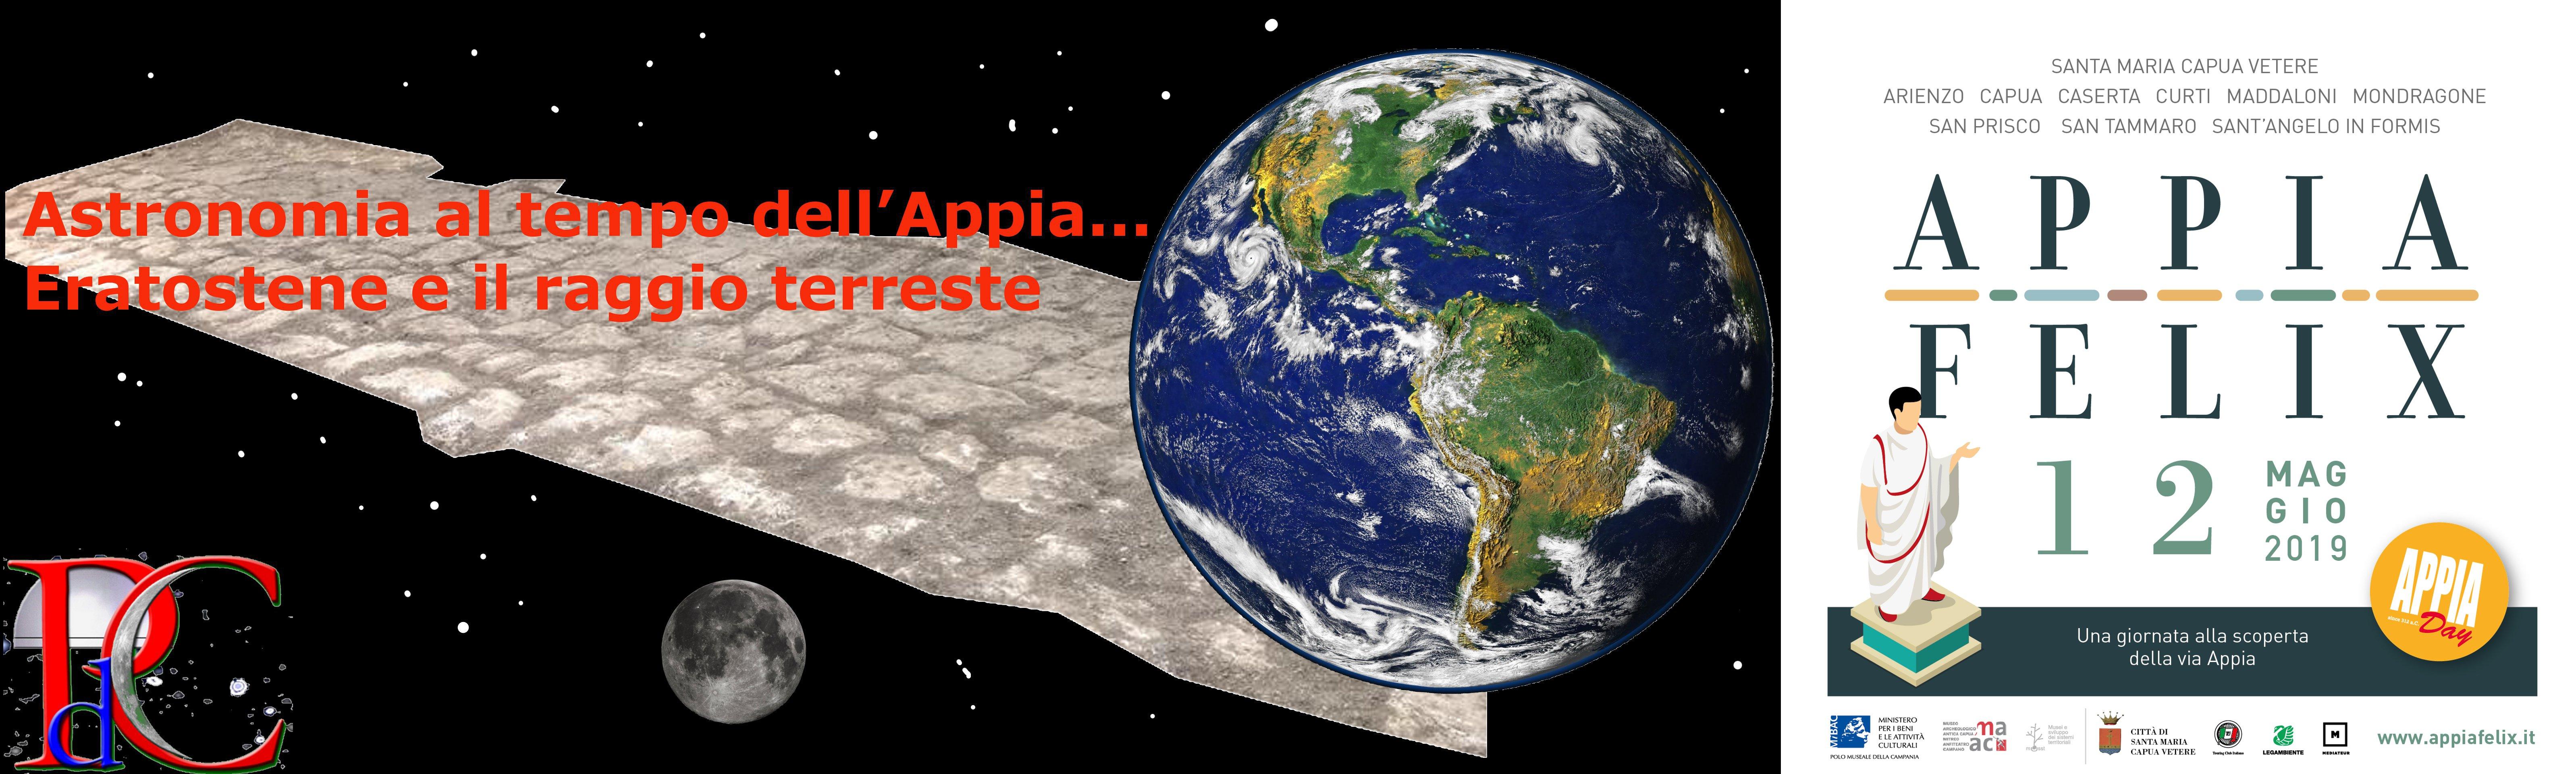 Appia Day Eratostene